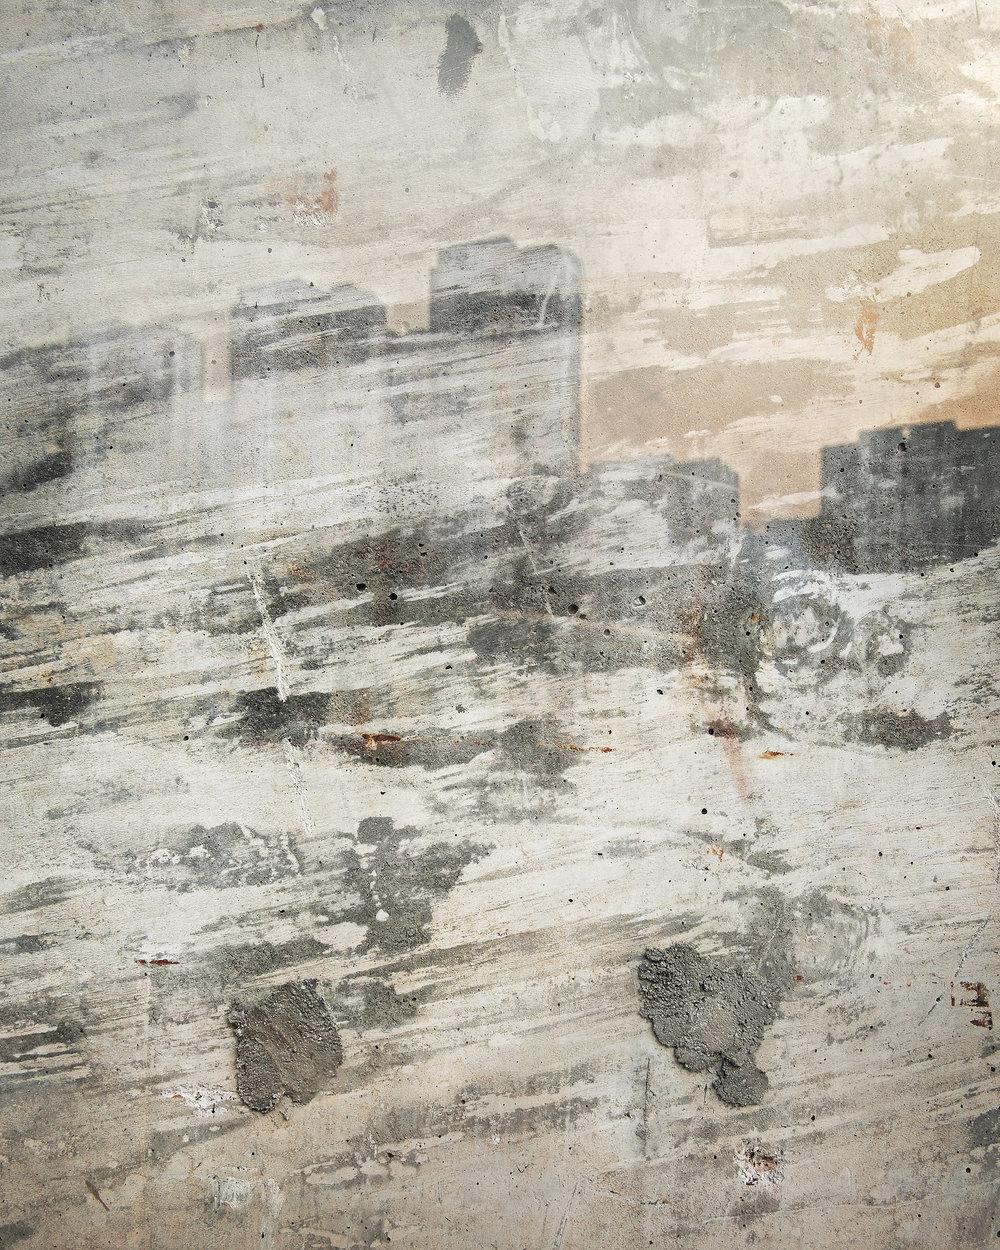 Marcel Heijnen, Swept, Hong Kong, 2013